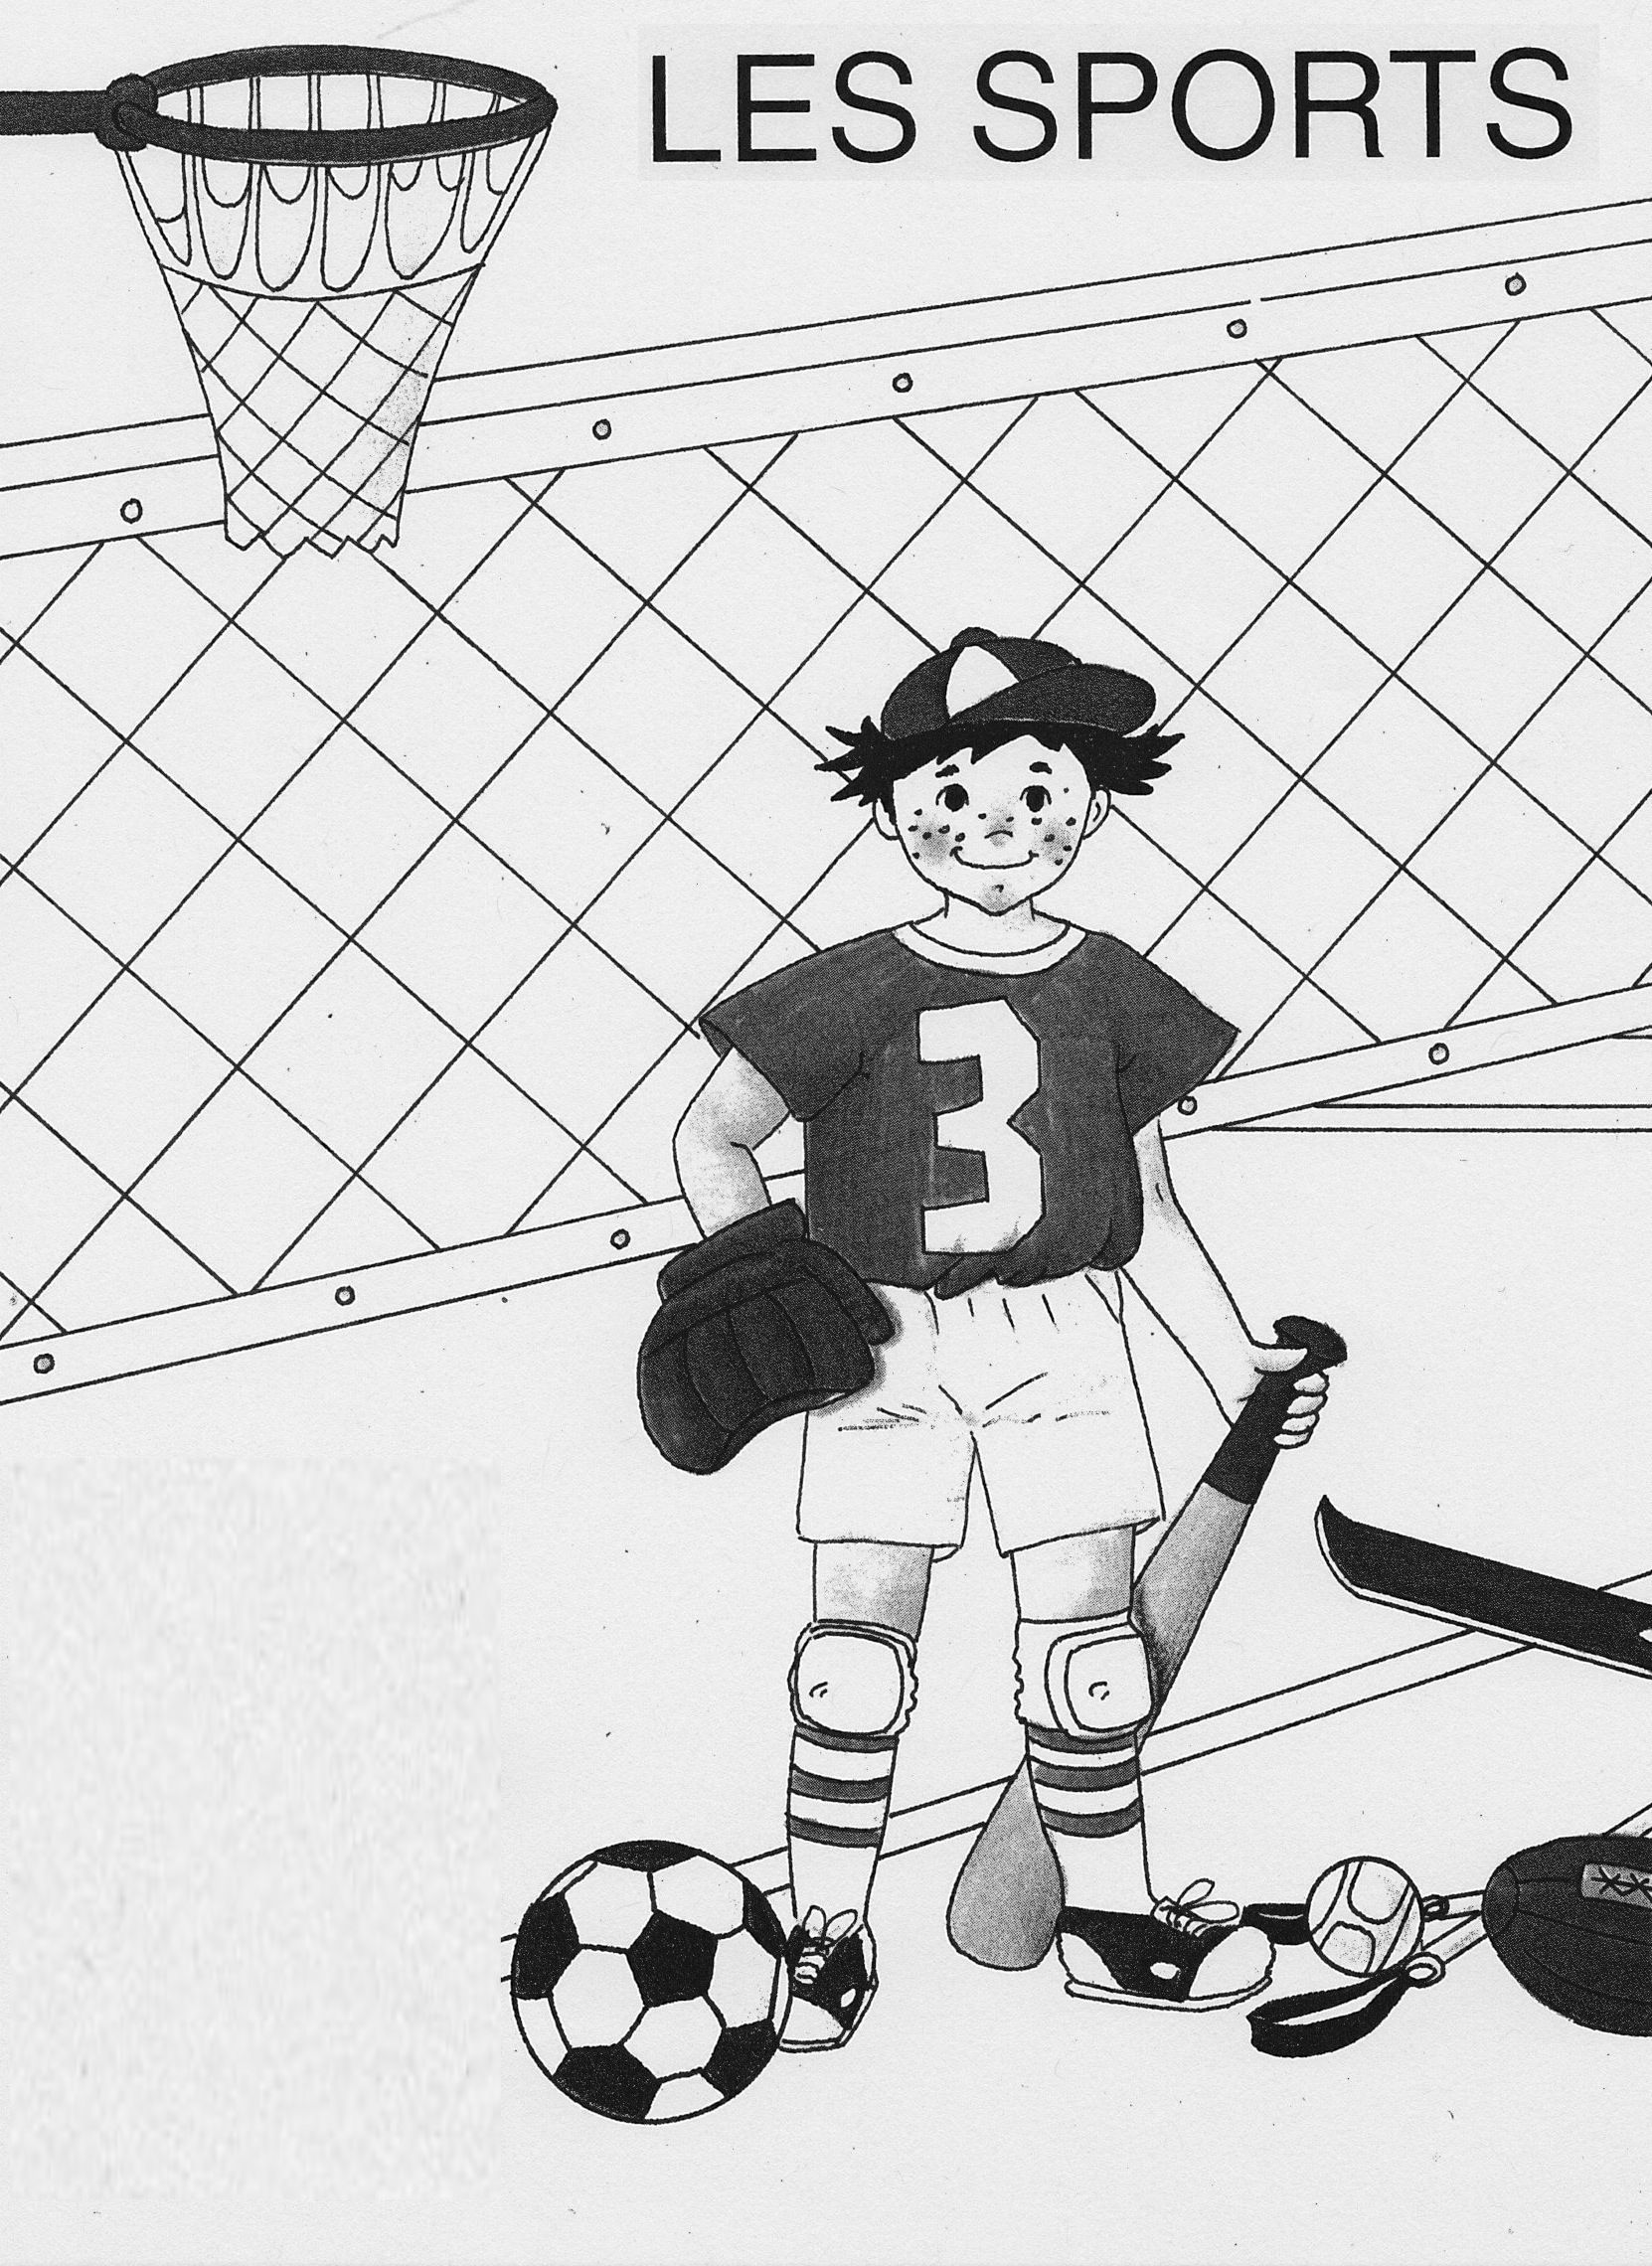 Les Sports 1 2